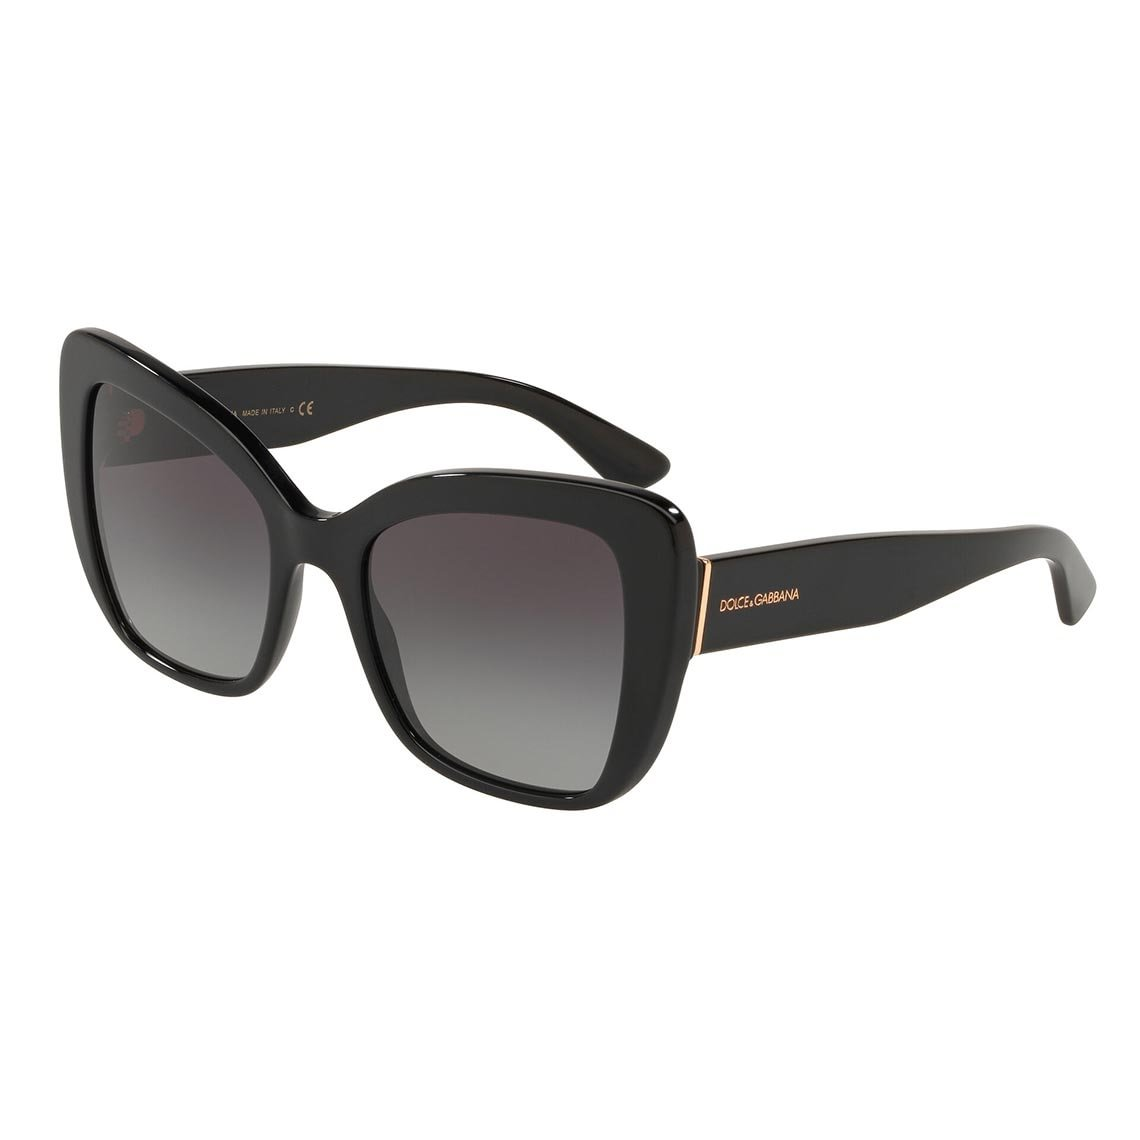 Dolce & Gabbana DG4348 501/8G 5420